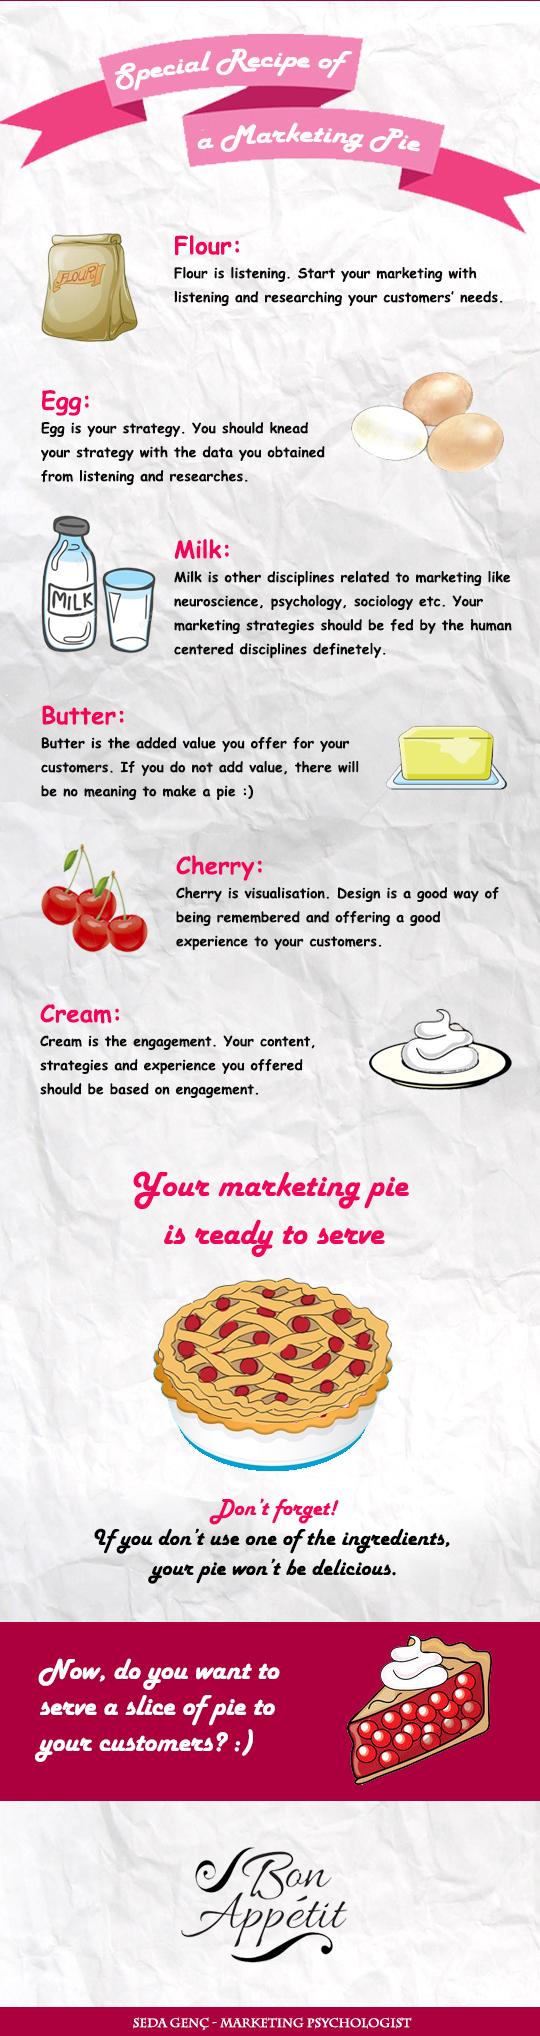 marketing pie